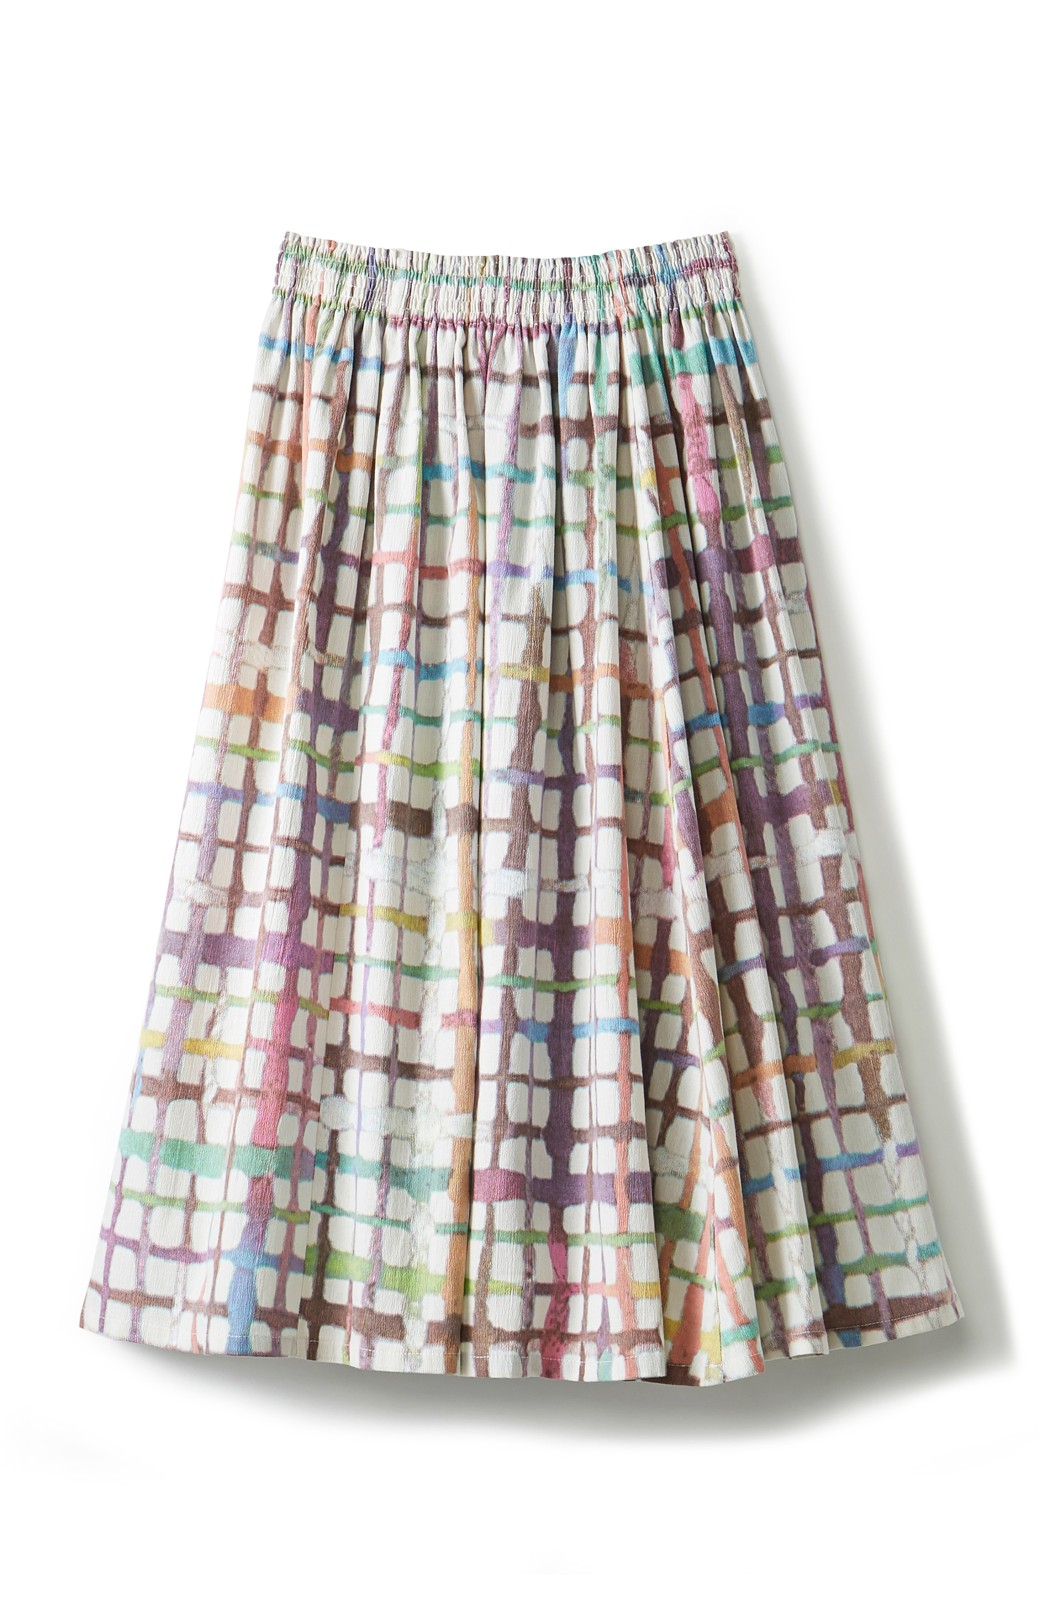 haco! 京都の浴衣屋さんと作った浴衣生地のスカート <ベージュ系その他>の商品写真1